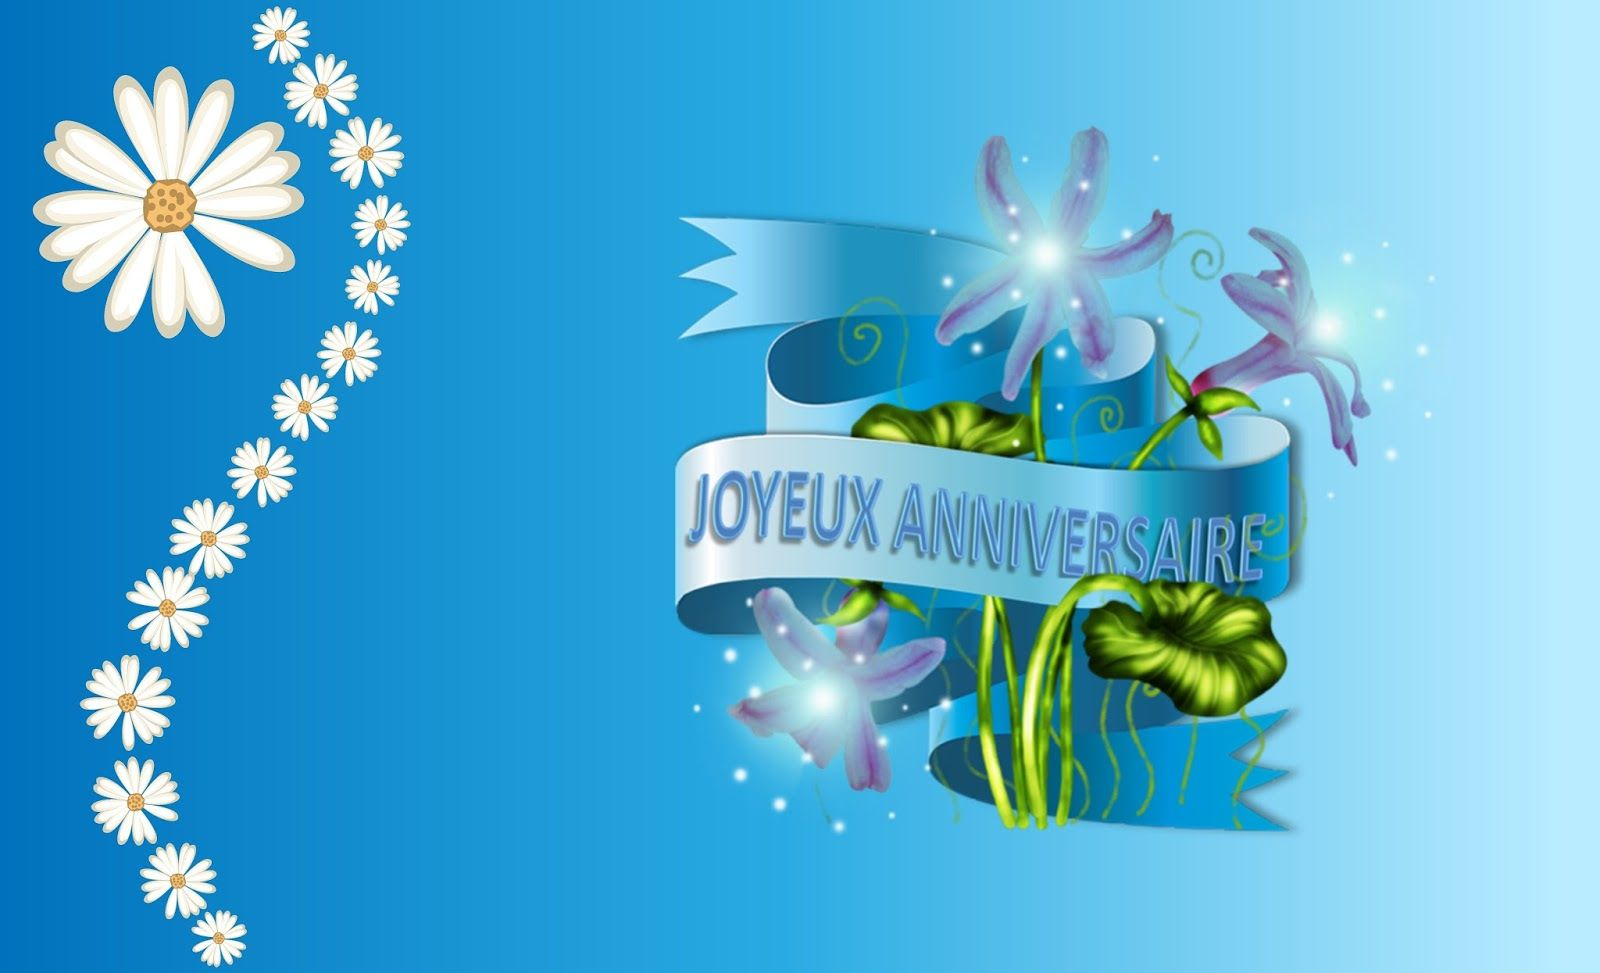 Fond D Ecran Anniversaire En Full Hd Anniversaire Joyeuse Anniversaire Image Anniversaire